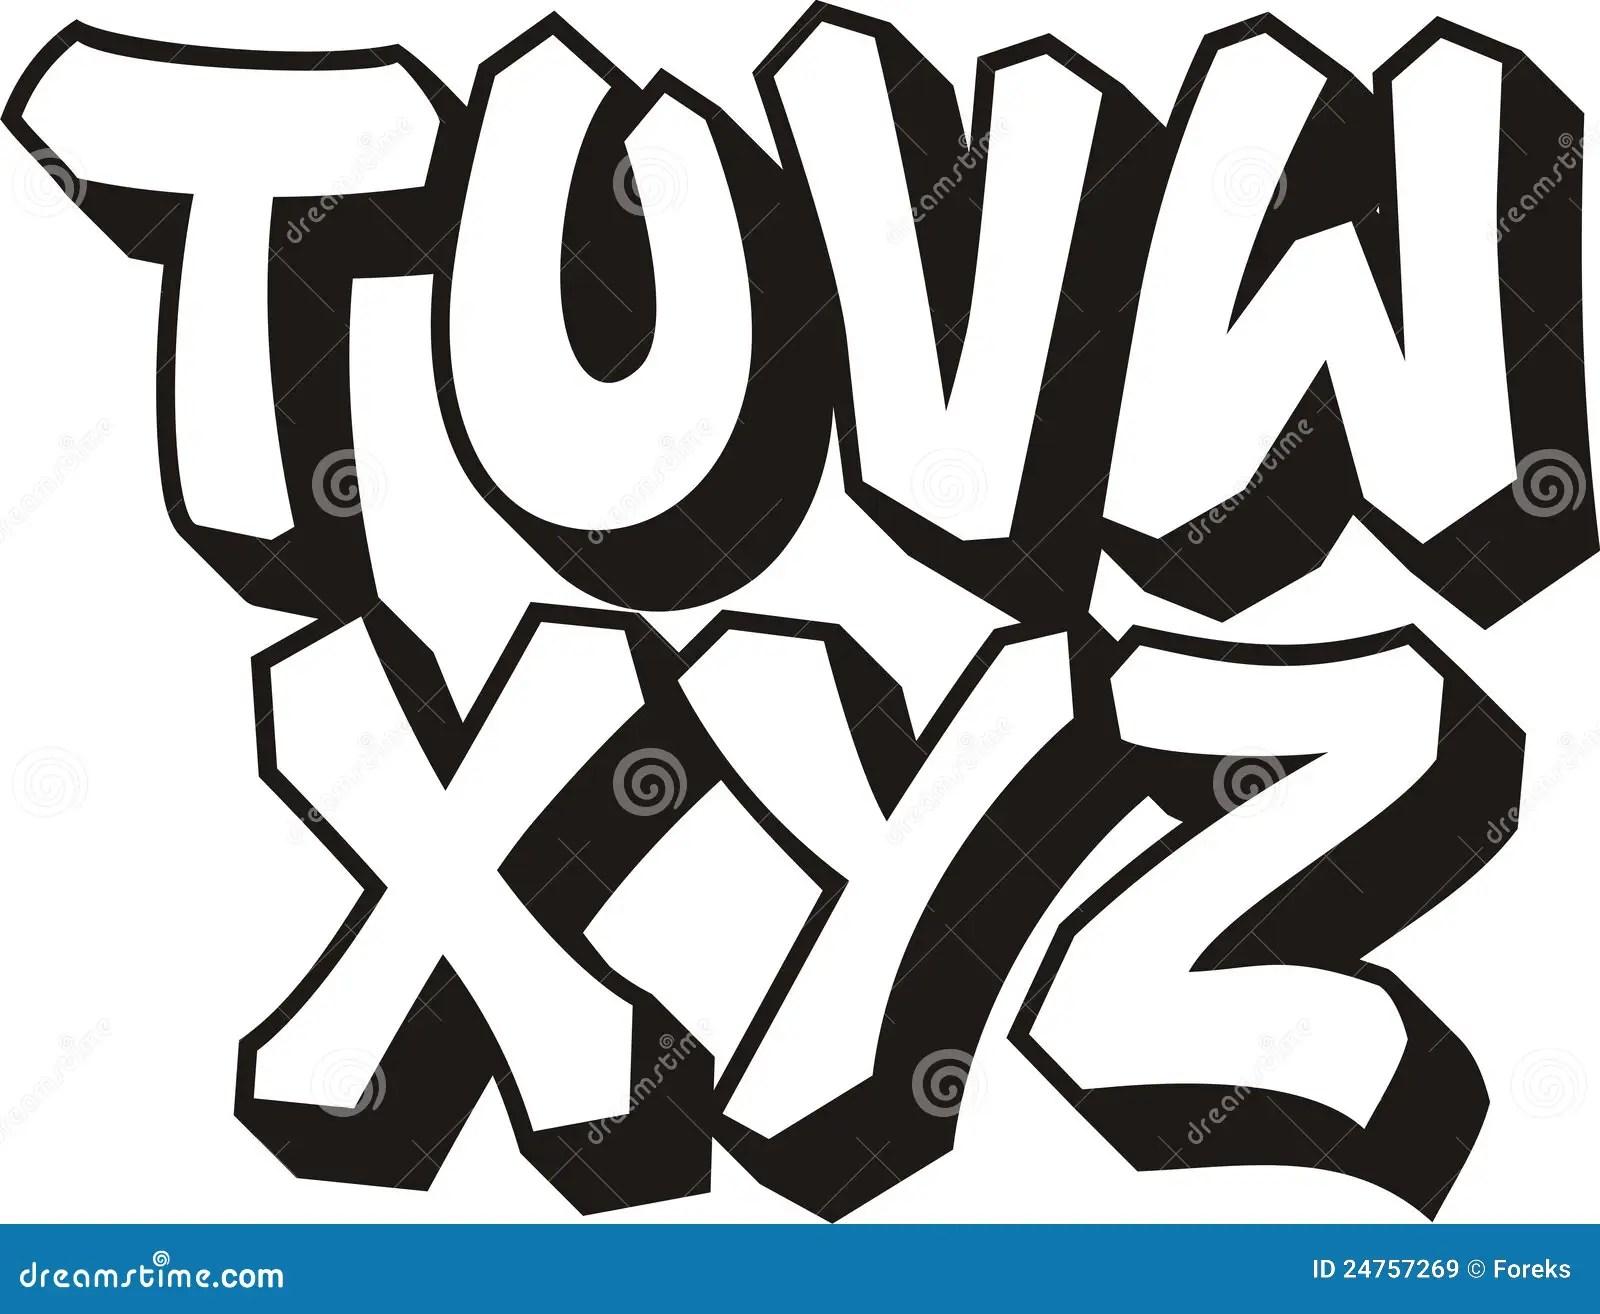 Graffiti Font Part 3 Stock Vector Illustration Of